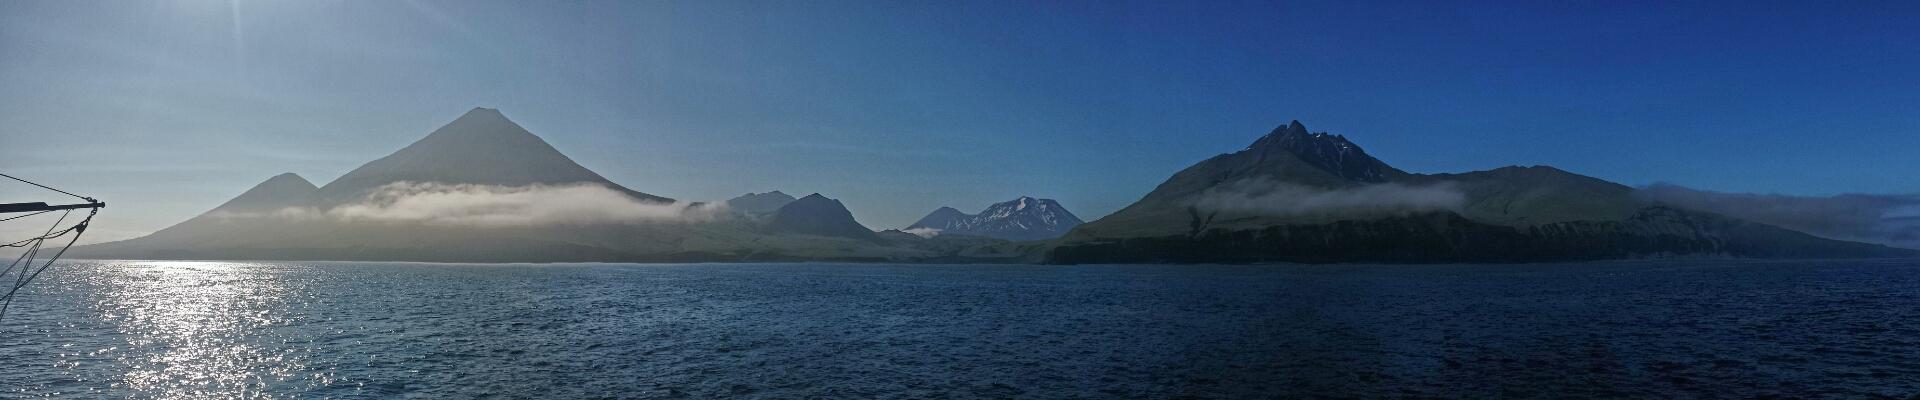 Panoramic off shore photo of Kiska island and volcanic mountains.